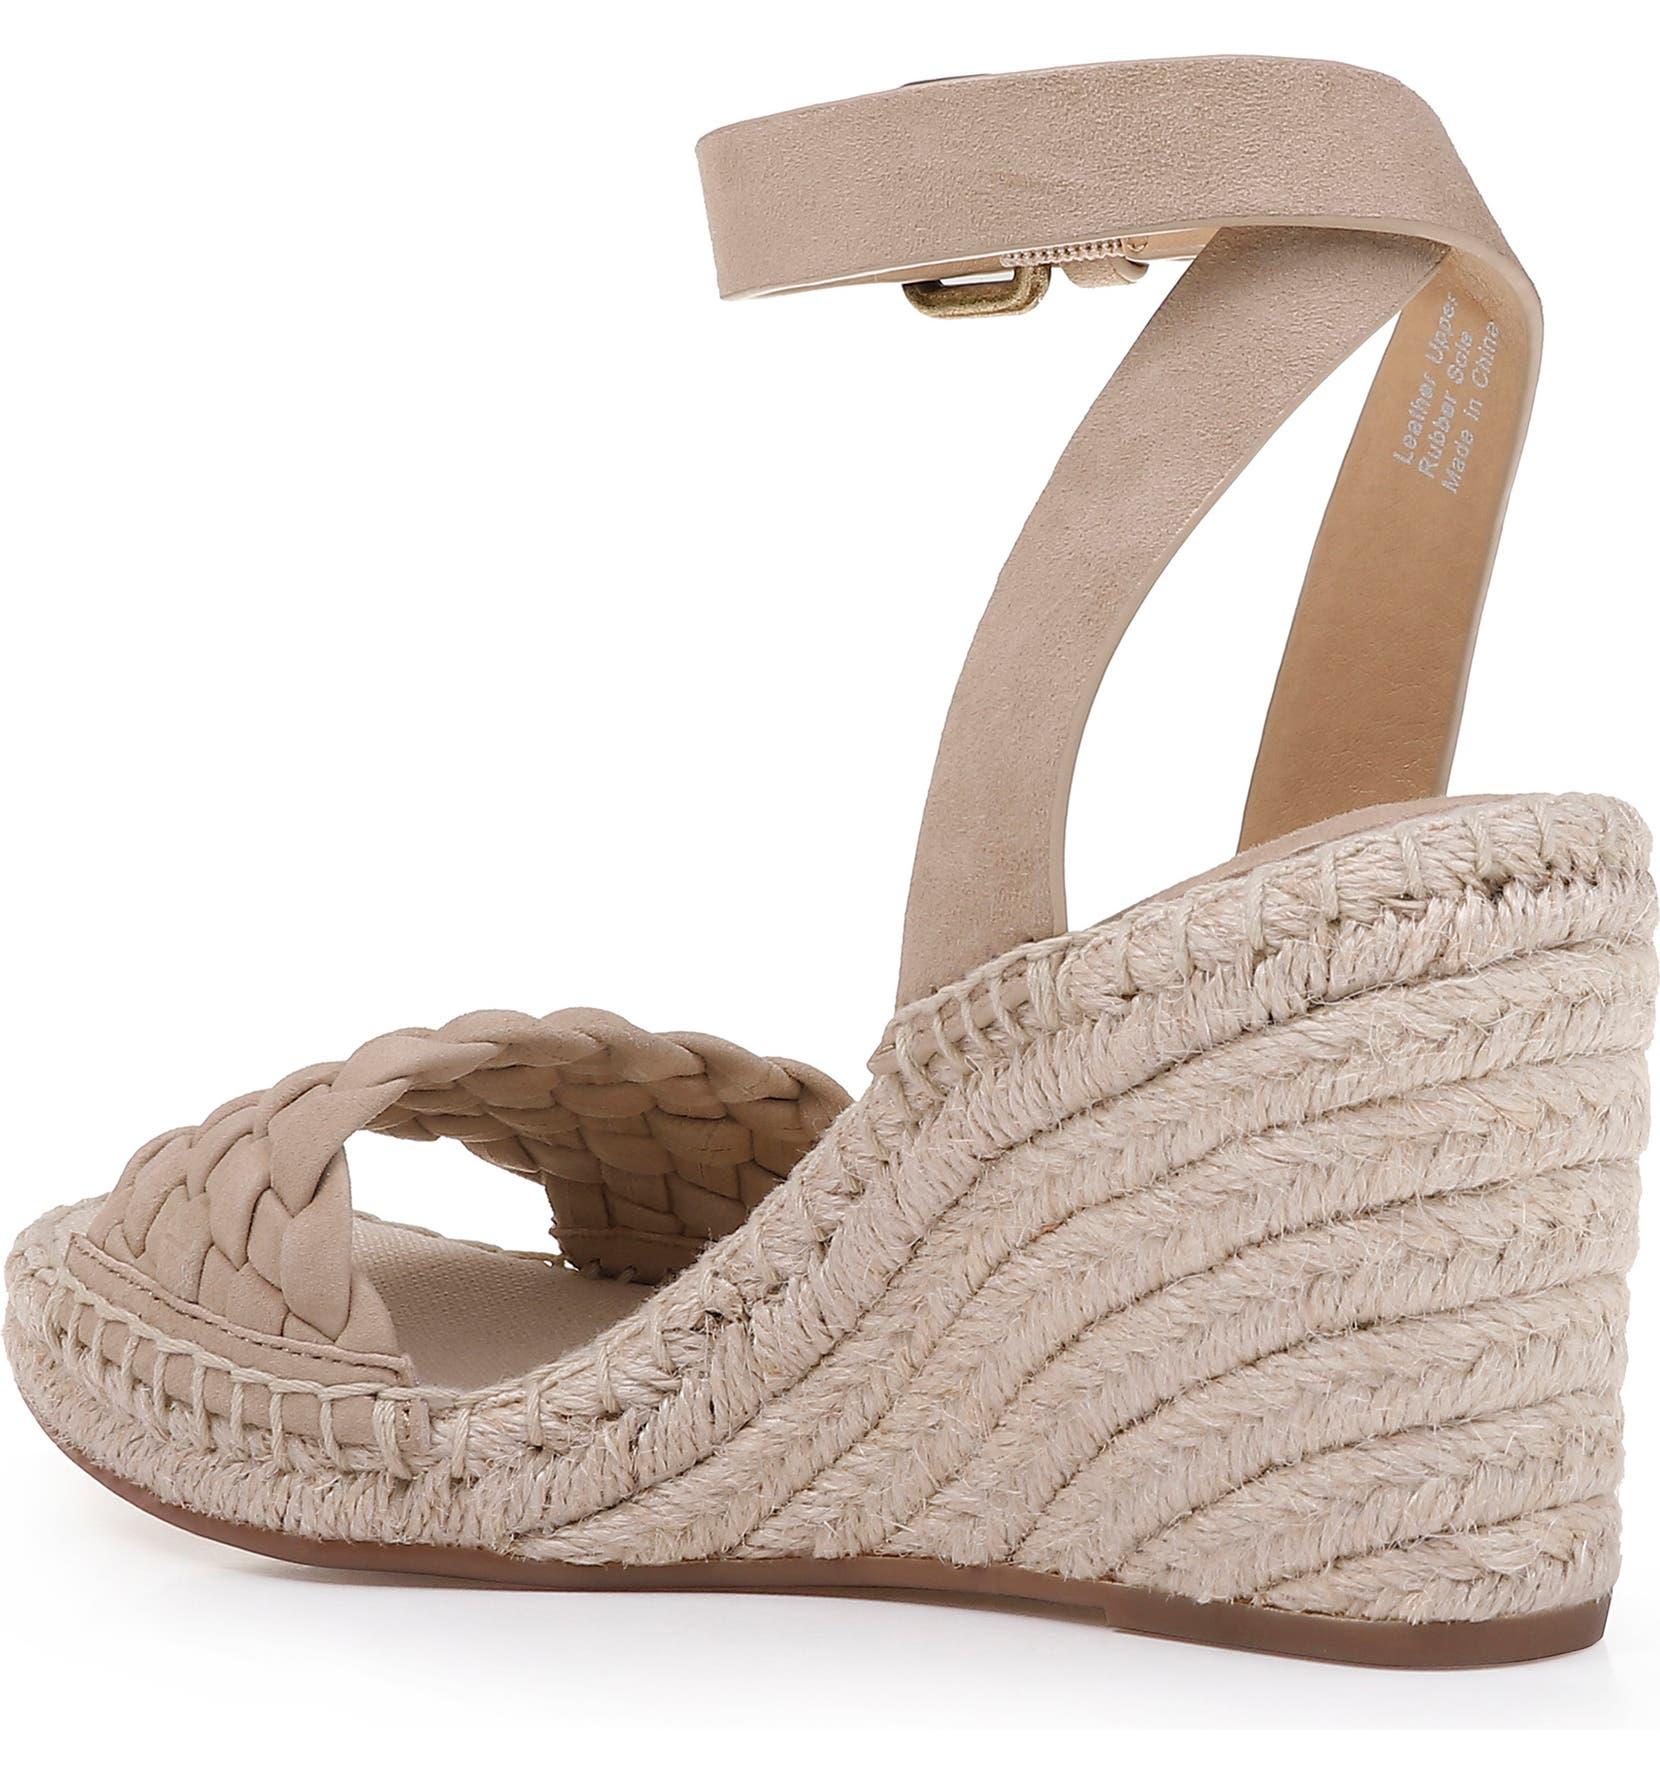 8d41318feb1 Tasman Woven Espadrille Sandal